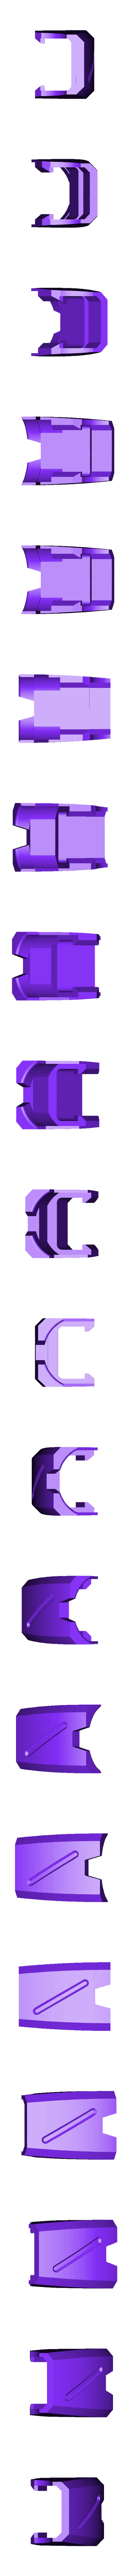 LegT1_Right_08_OliveGreen.stl Download STL file Heavy Gun Walker • 3D print design, Jwoong